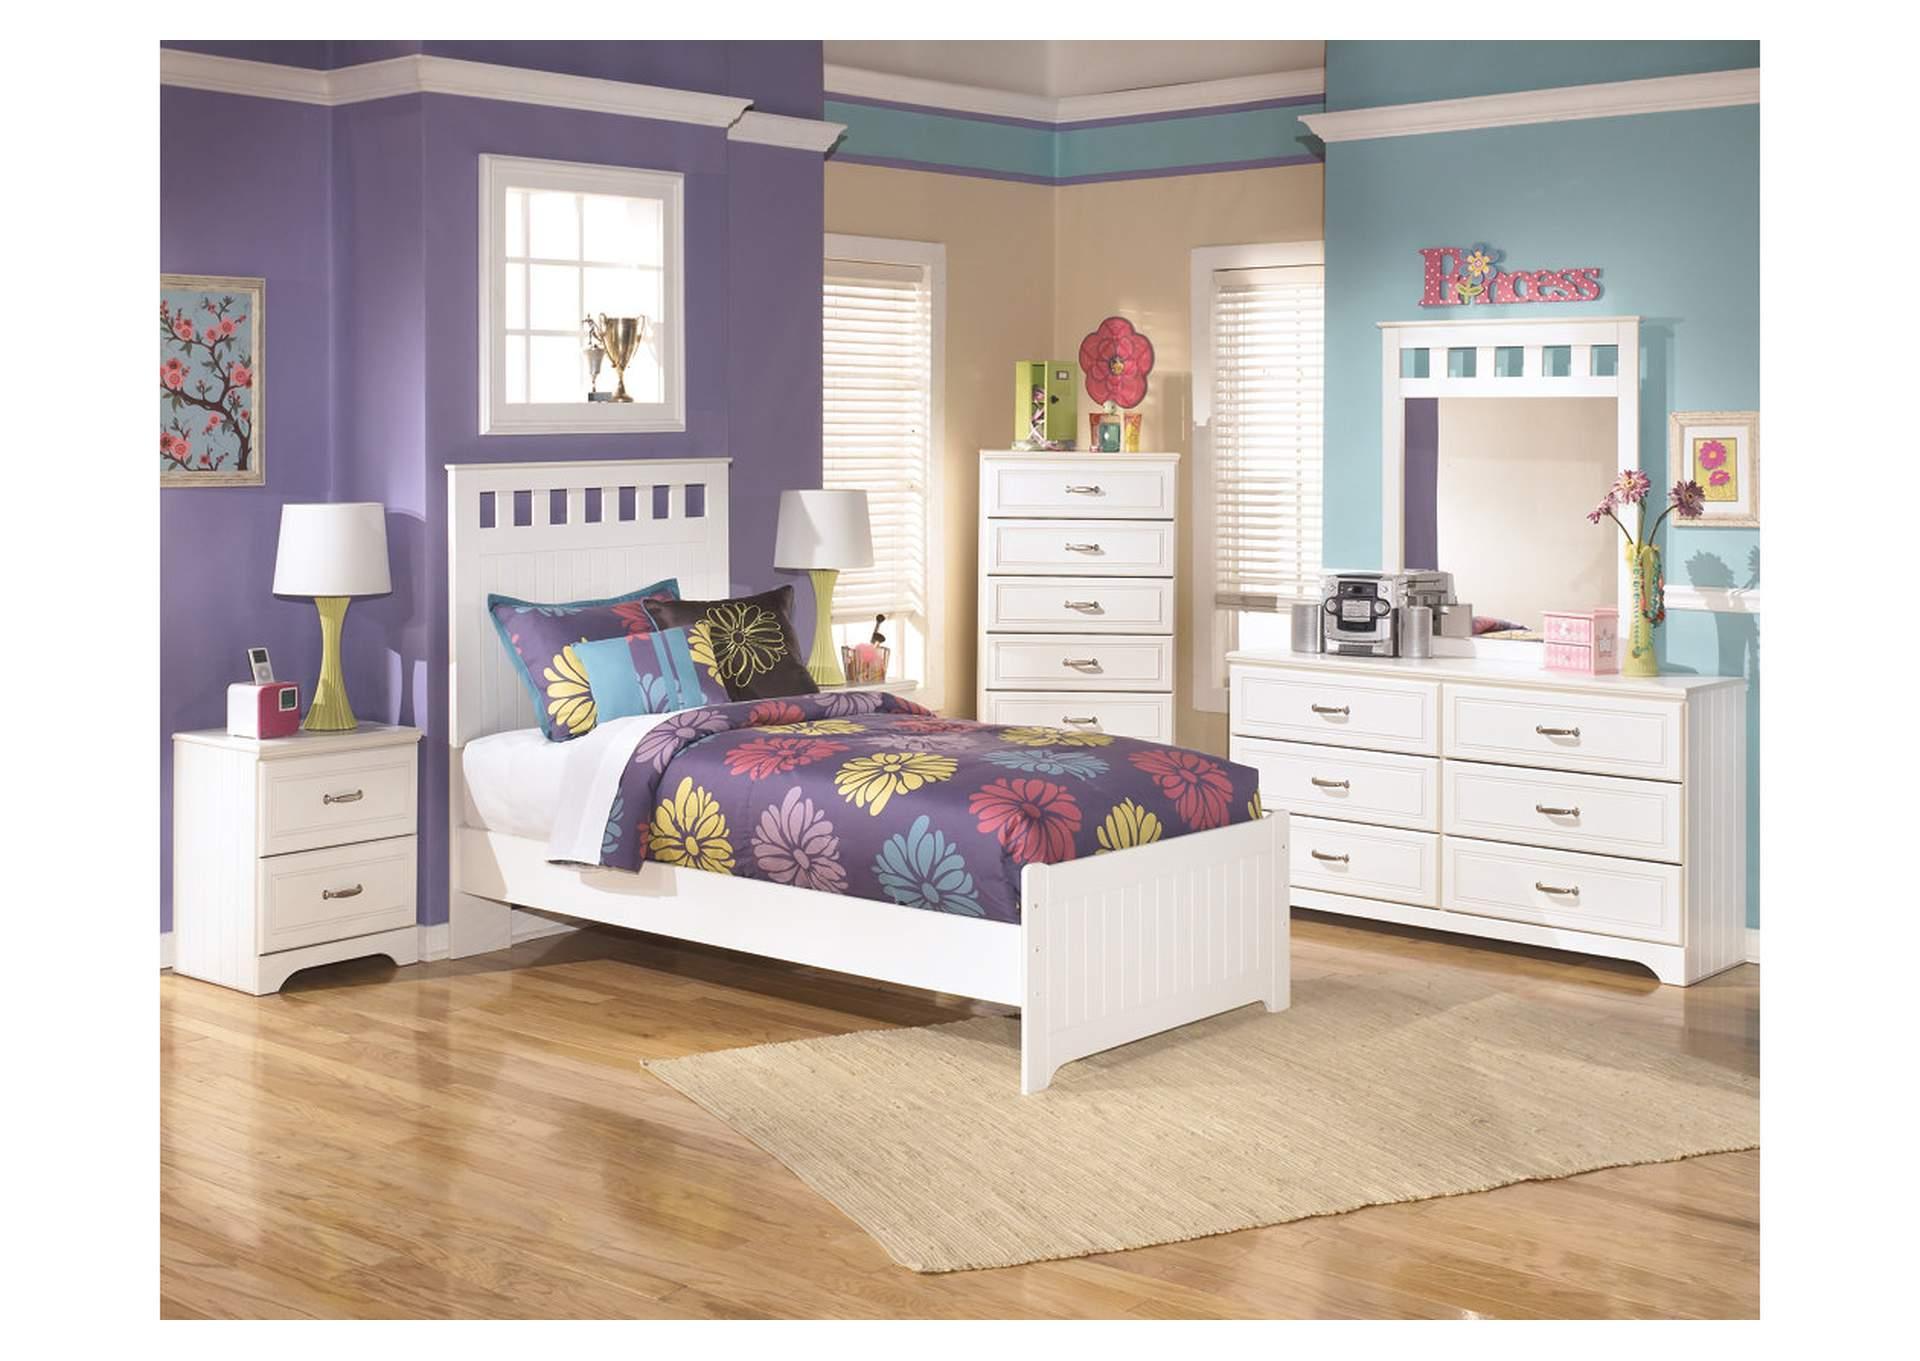 Panel Doble Lulu Bed w/Dresser & Mirror